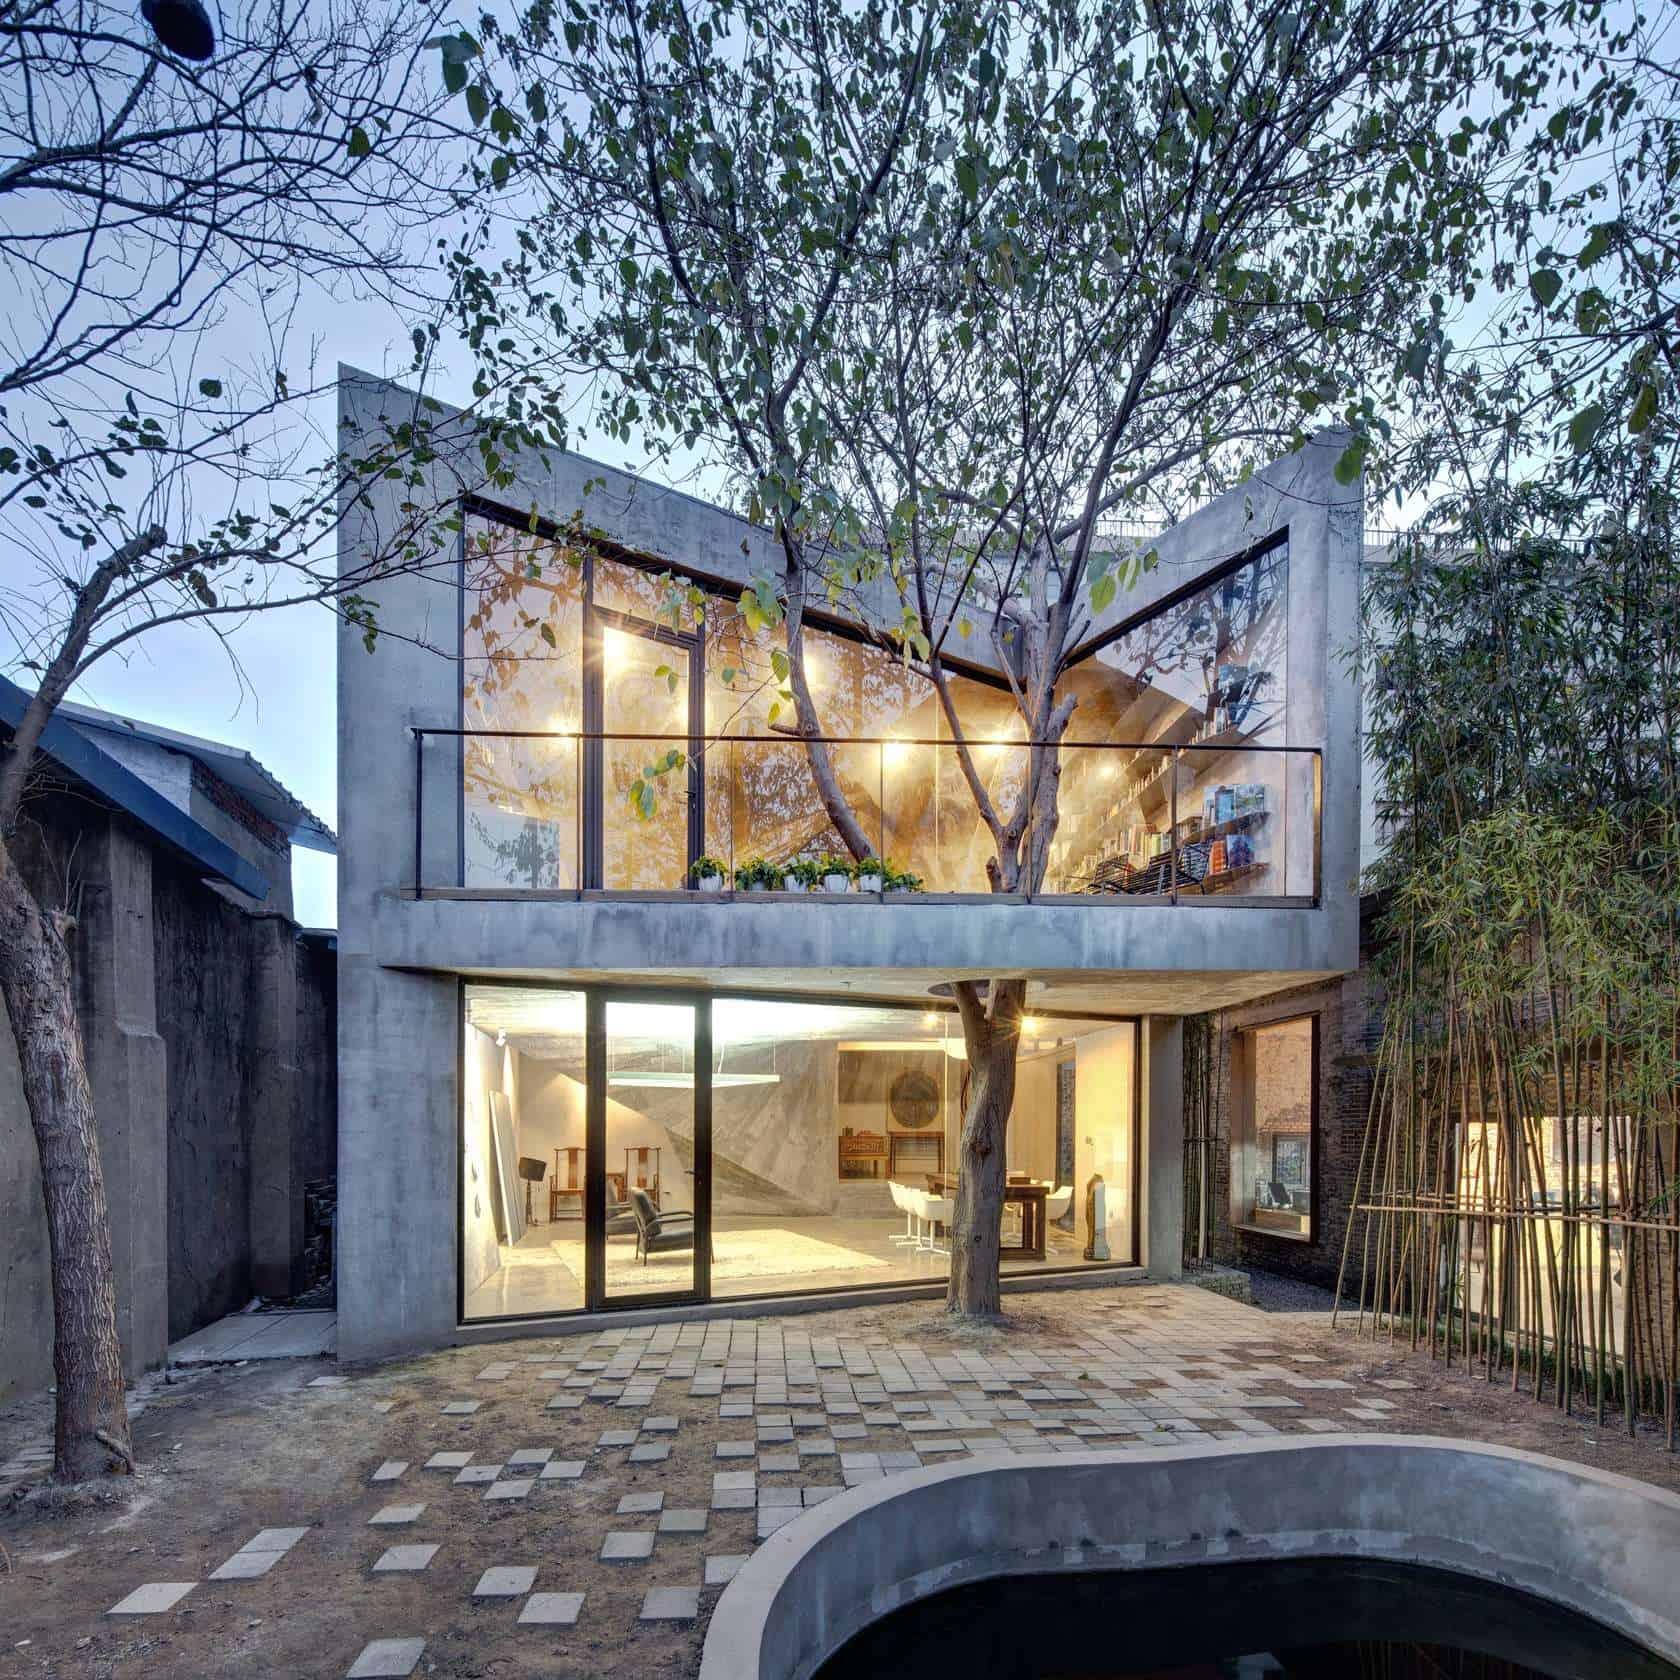 Best Kitchen Gallery: Advanced Digital Architecture And A Tree Define This Unique Concrete of Build Concrete Home on rachelxblog.com